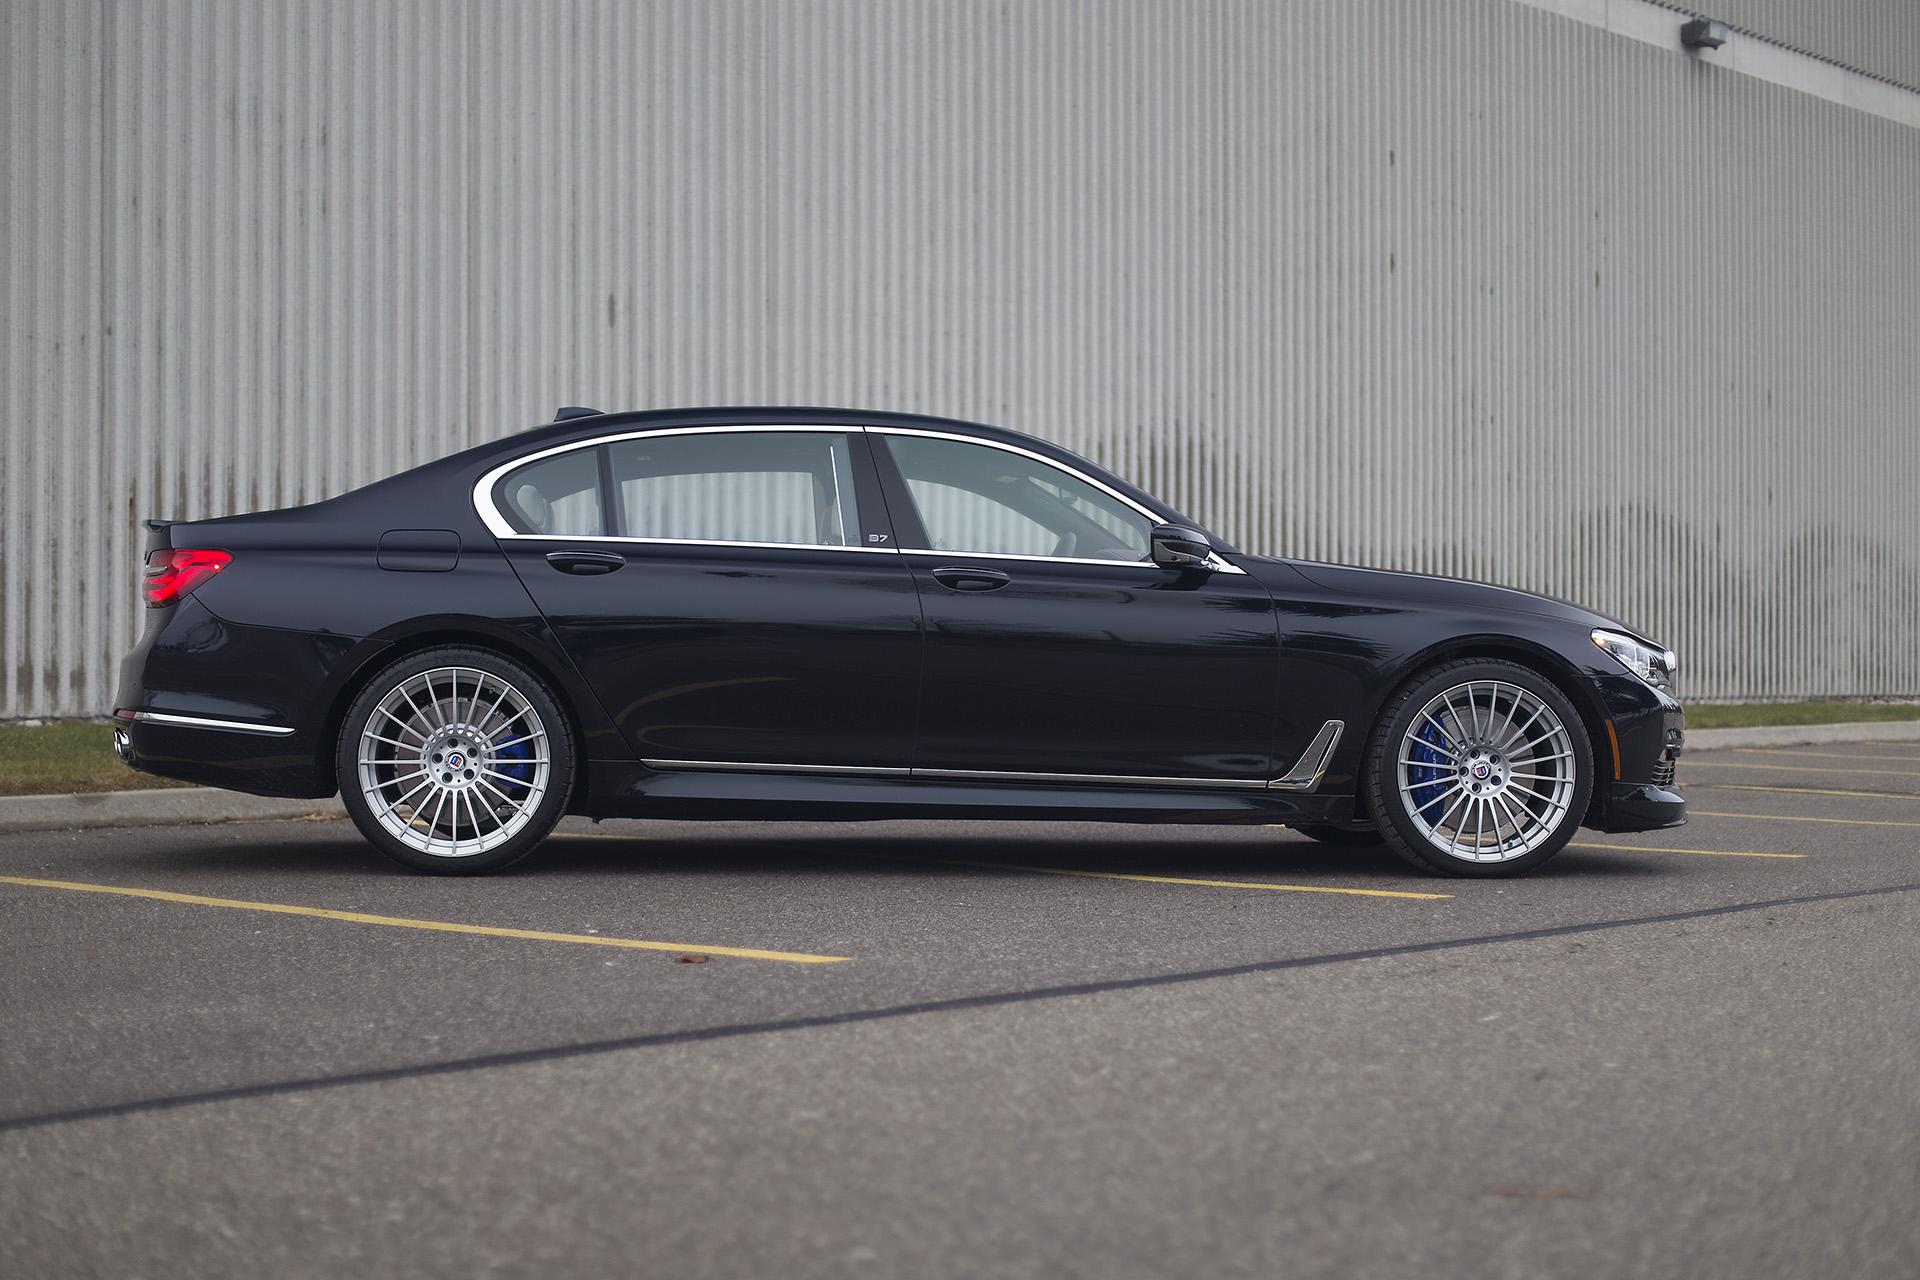 2017 BMW B7 Alpina  Azurite Black on Smoke White Updated Pictures